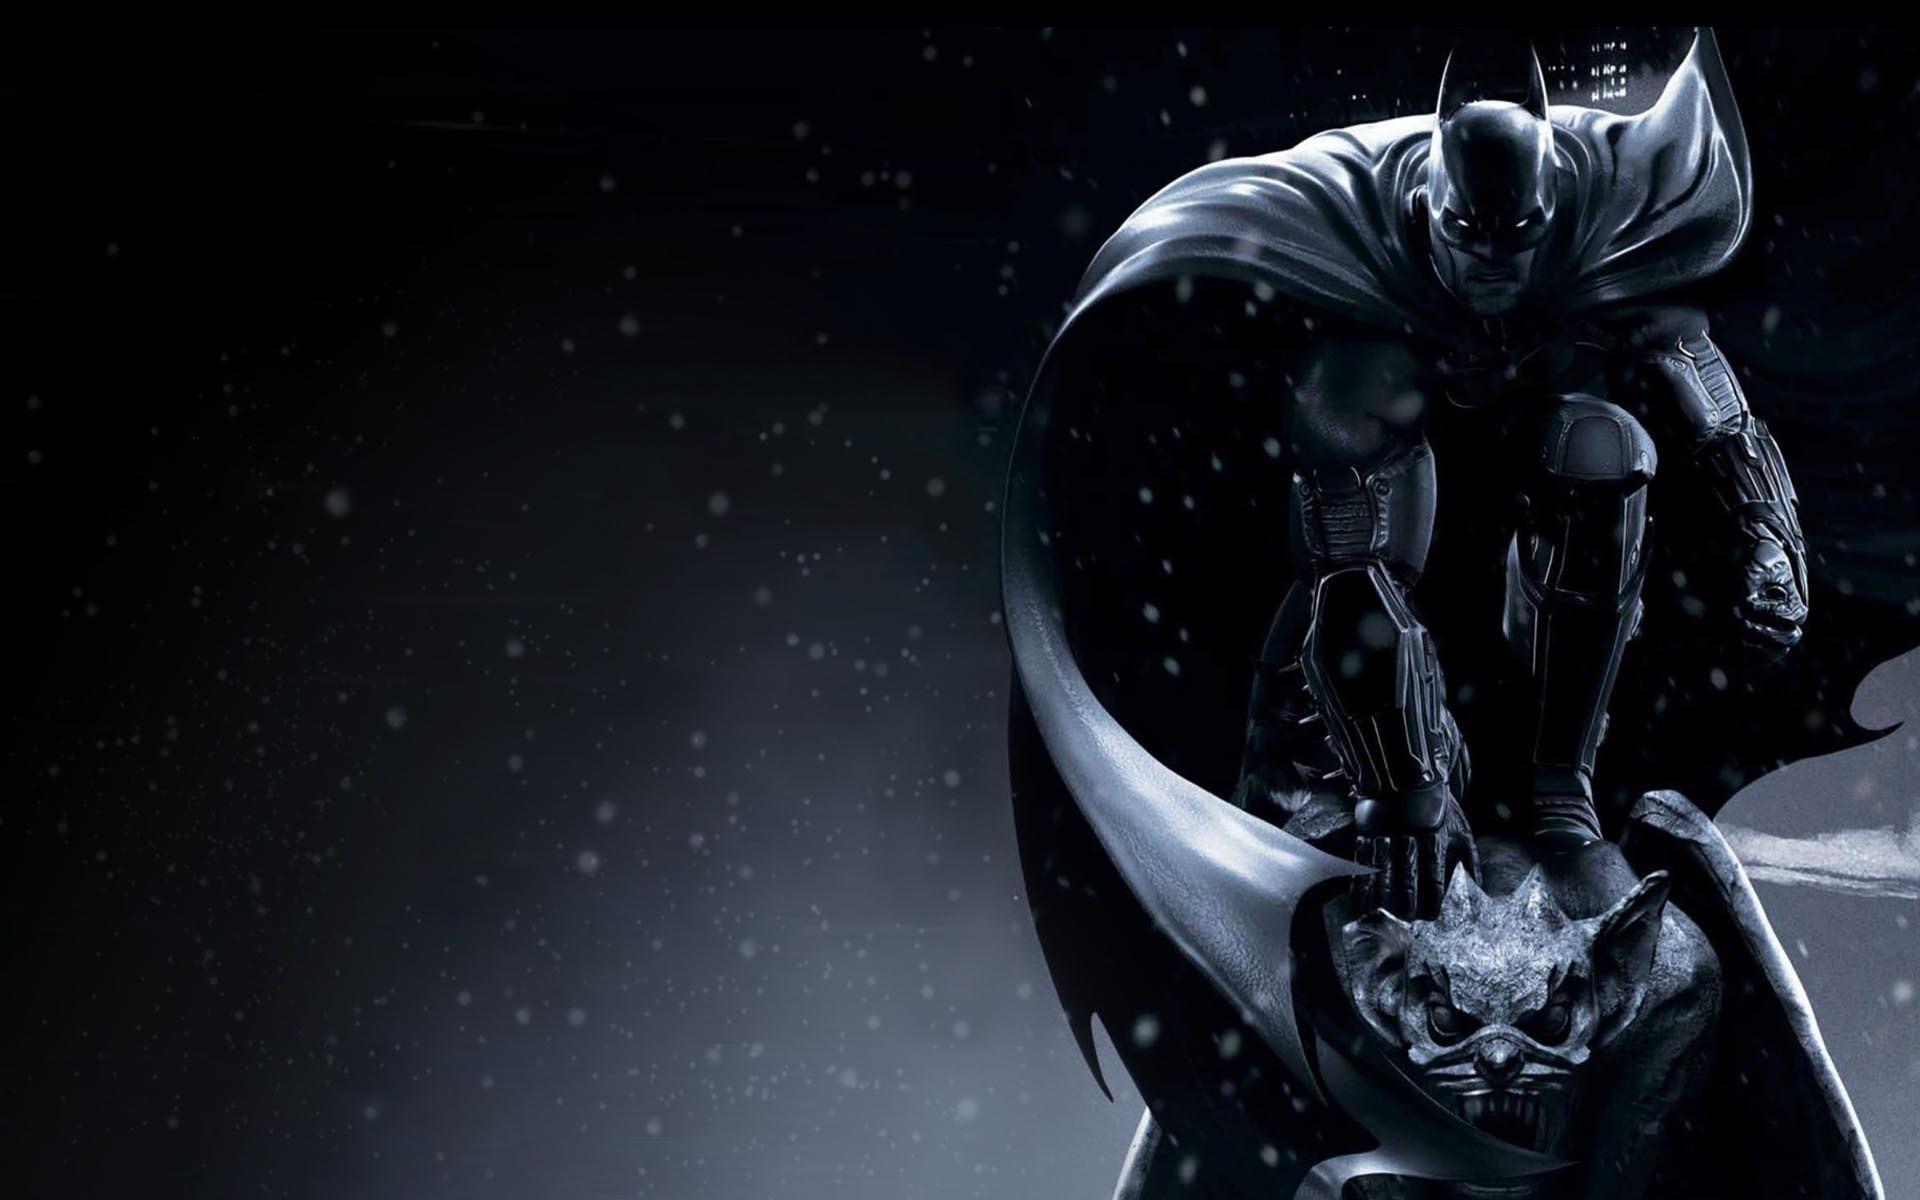 Batman Arkham Origins Hd Wallpaper Background Image 1920x1200